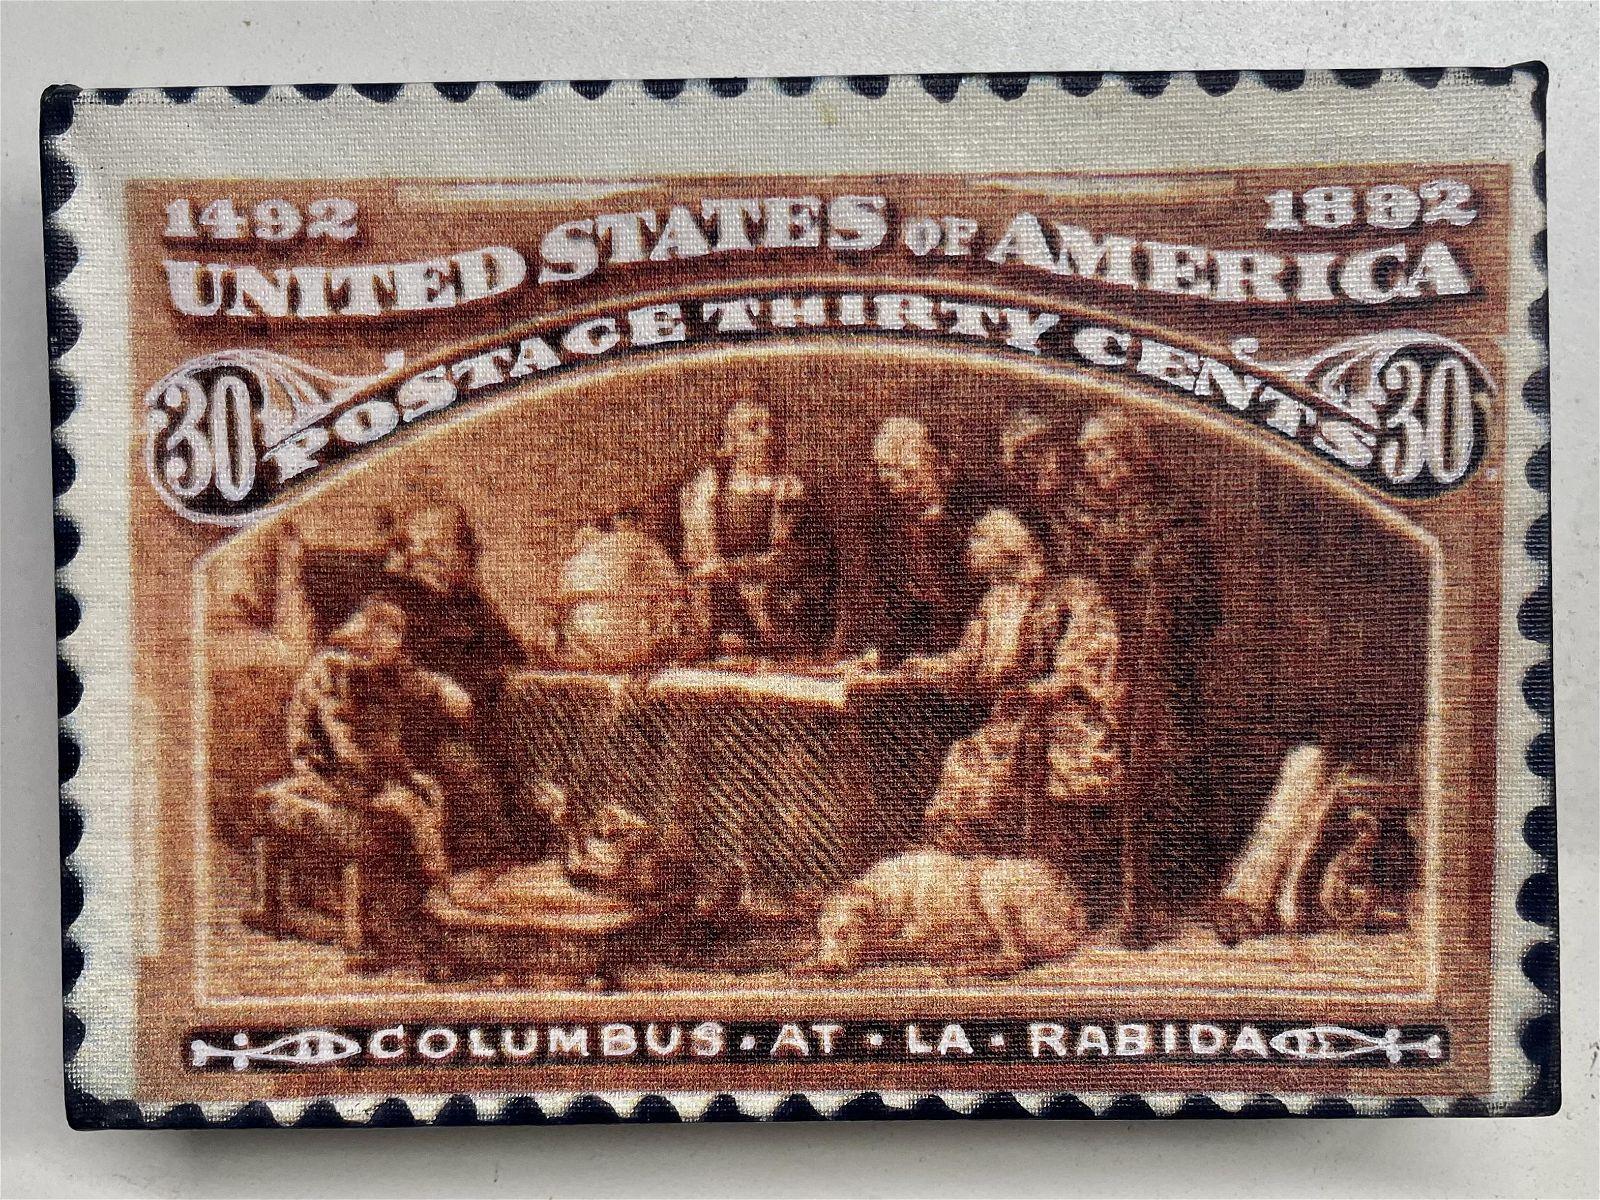 Columbus at La Rabida 30 Cents by Steve Kaufman KAW